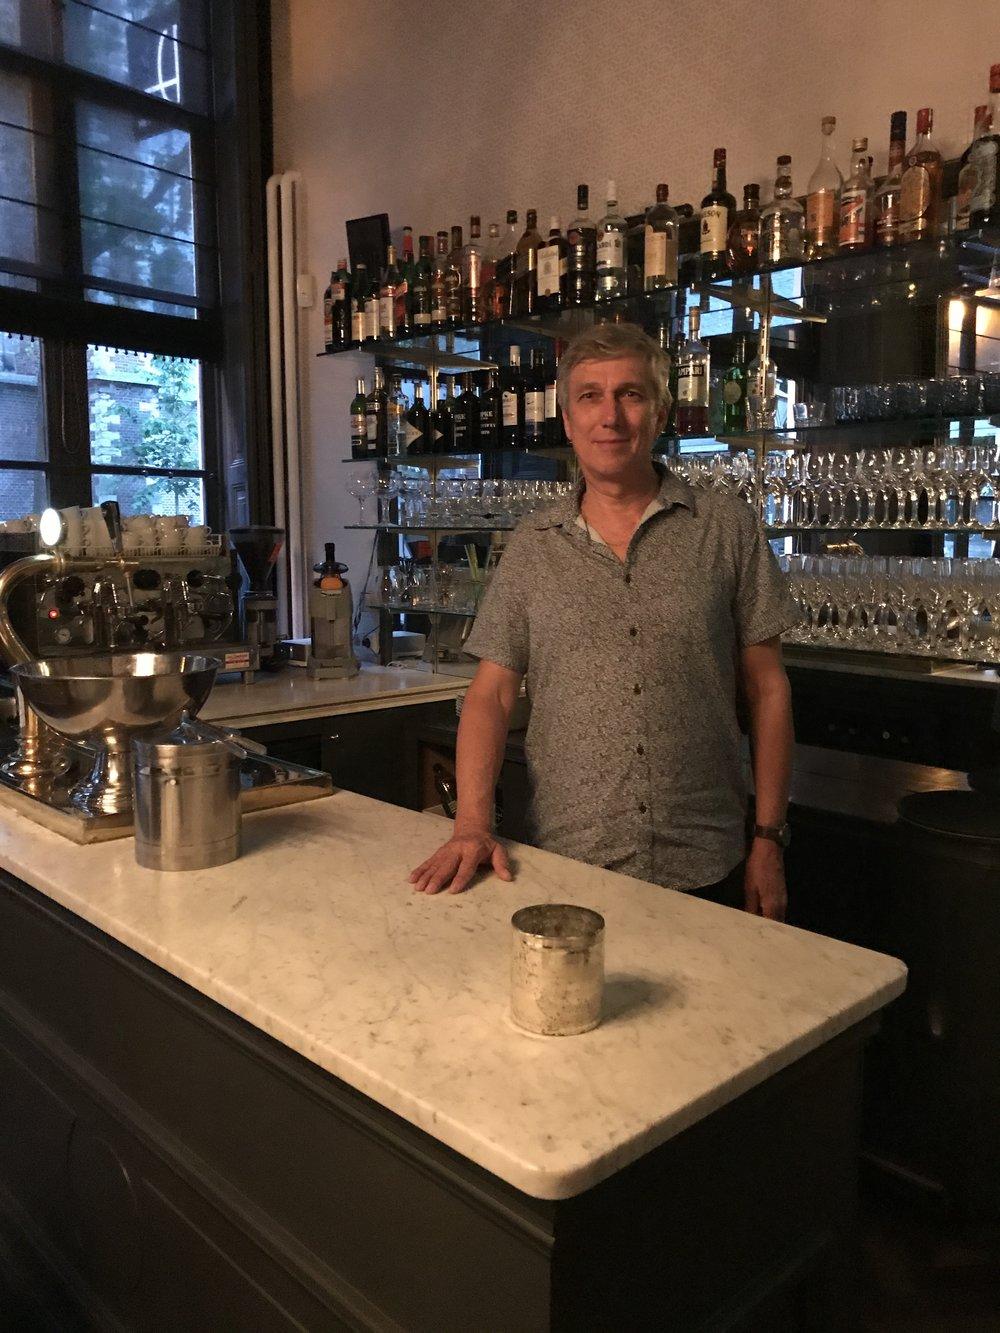 Tony behind the bar at the Printenkabinet Restaurant ...